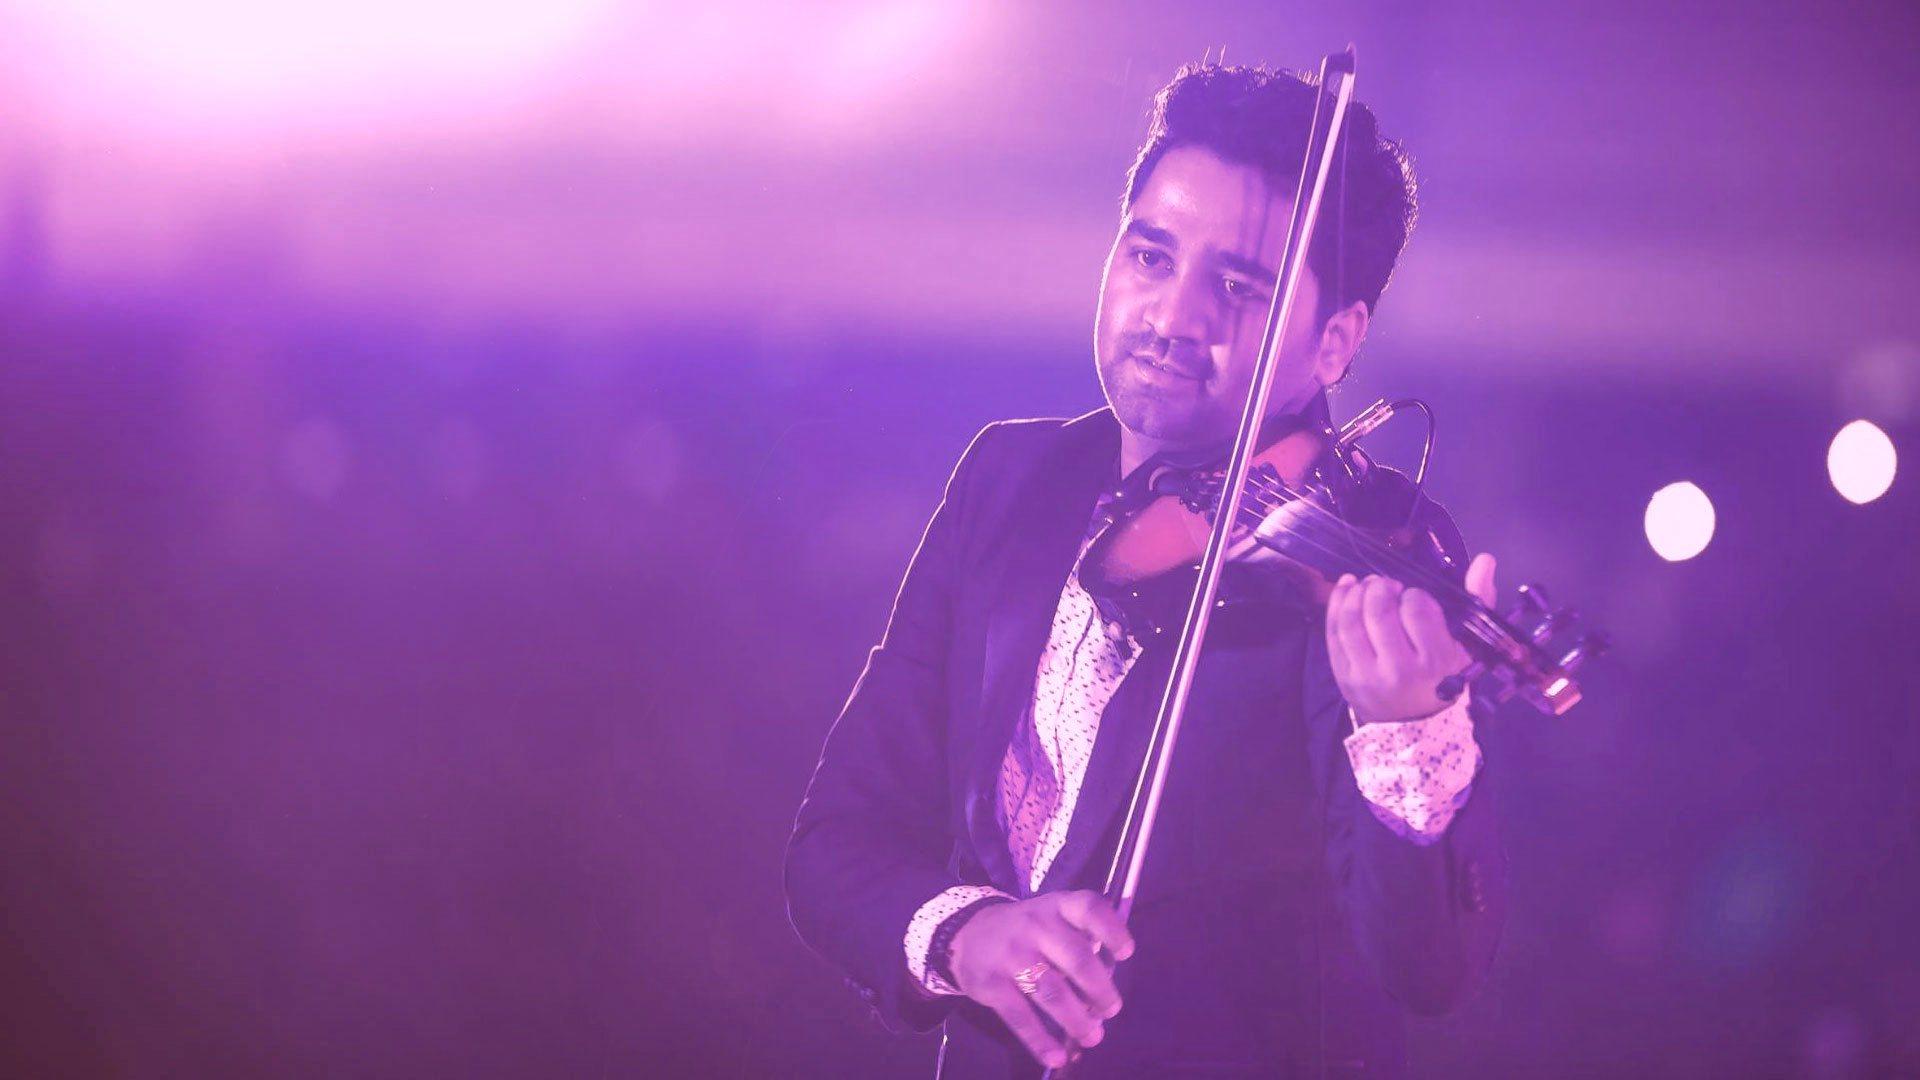 Jazz Violinist, Composer, Indian Violinist, musician